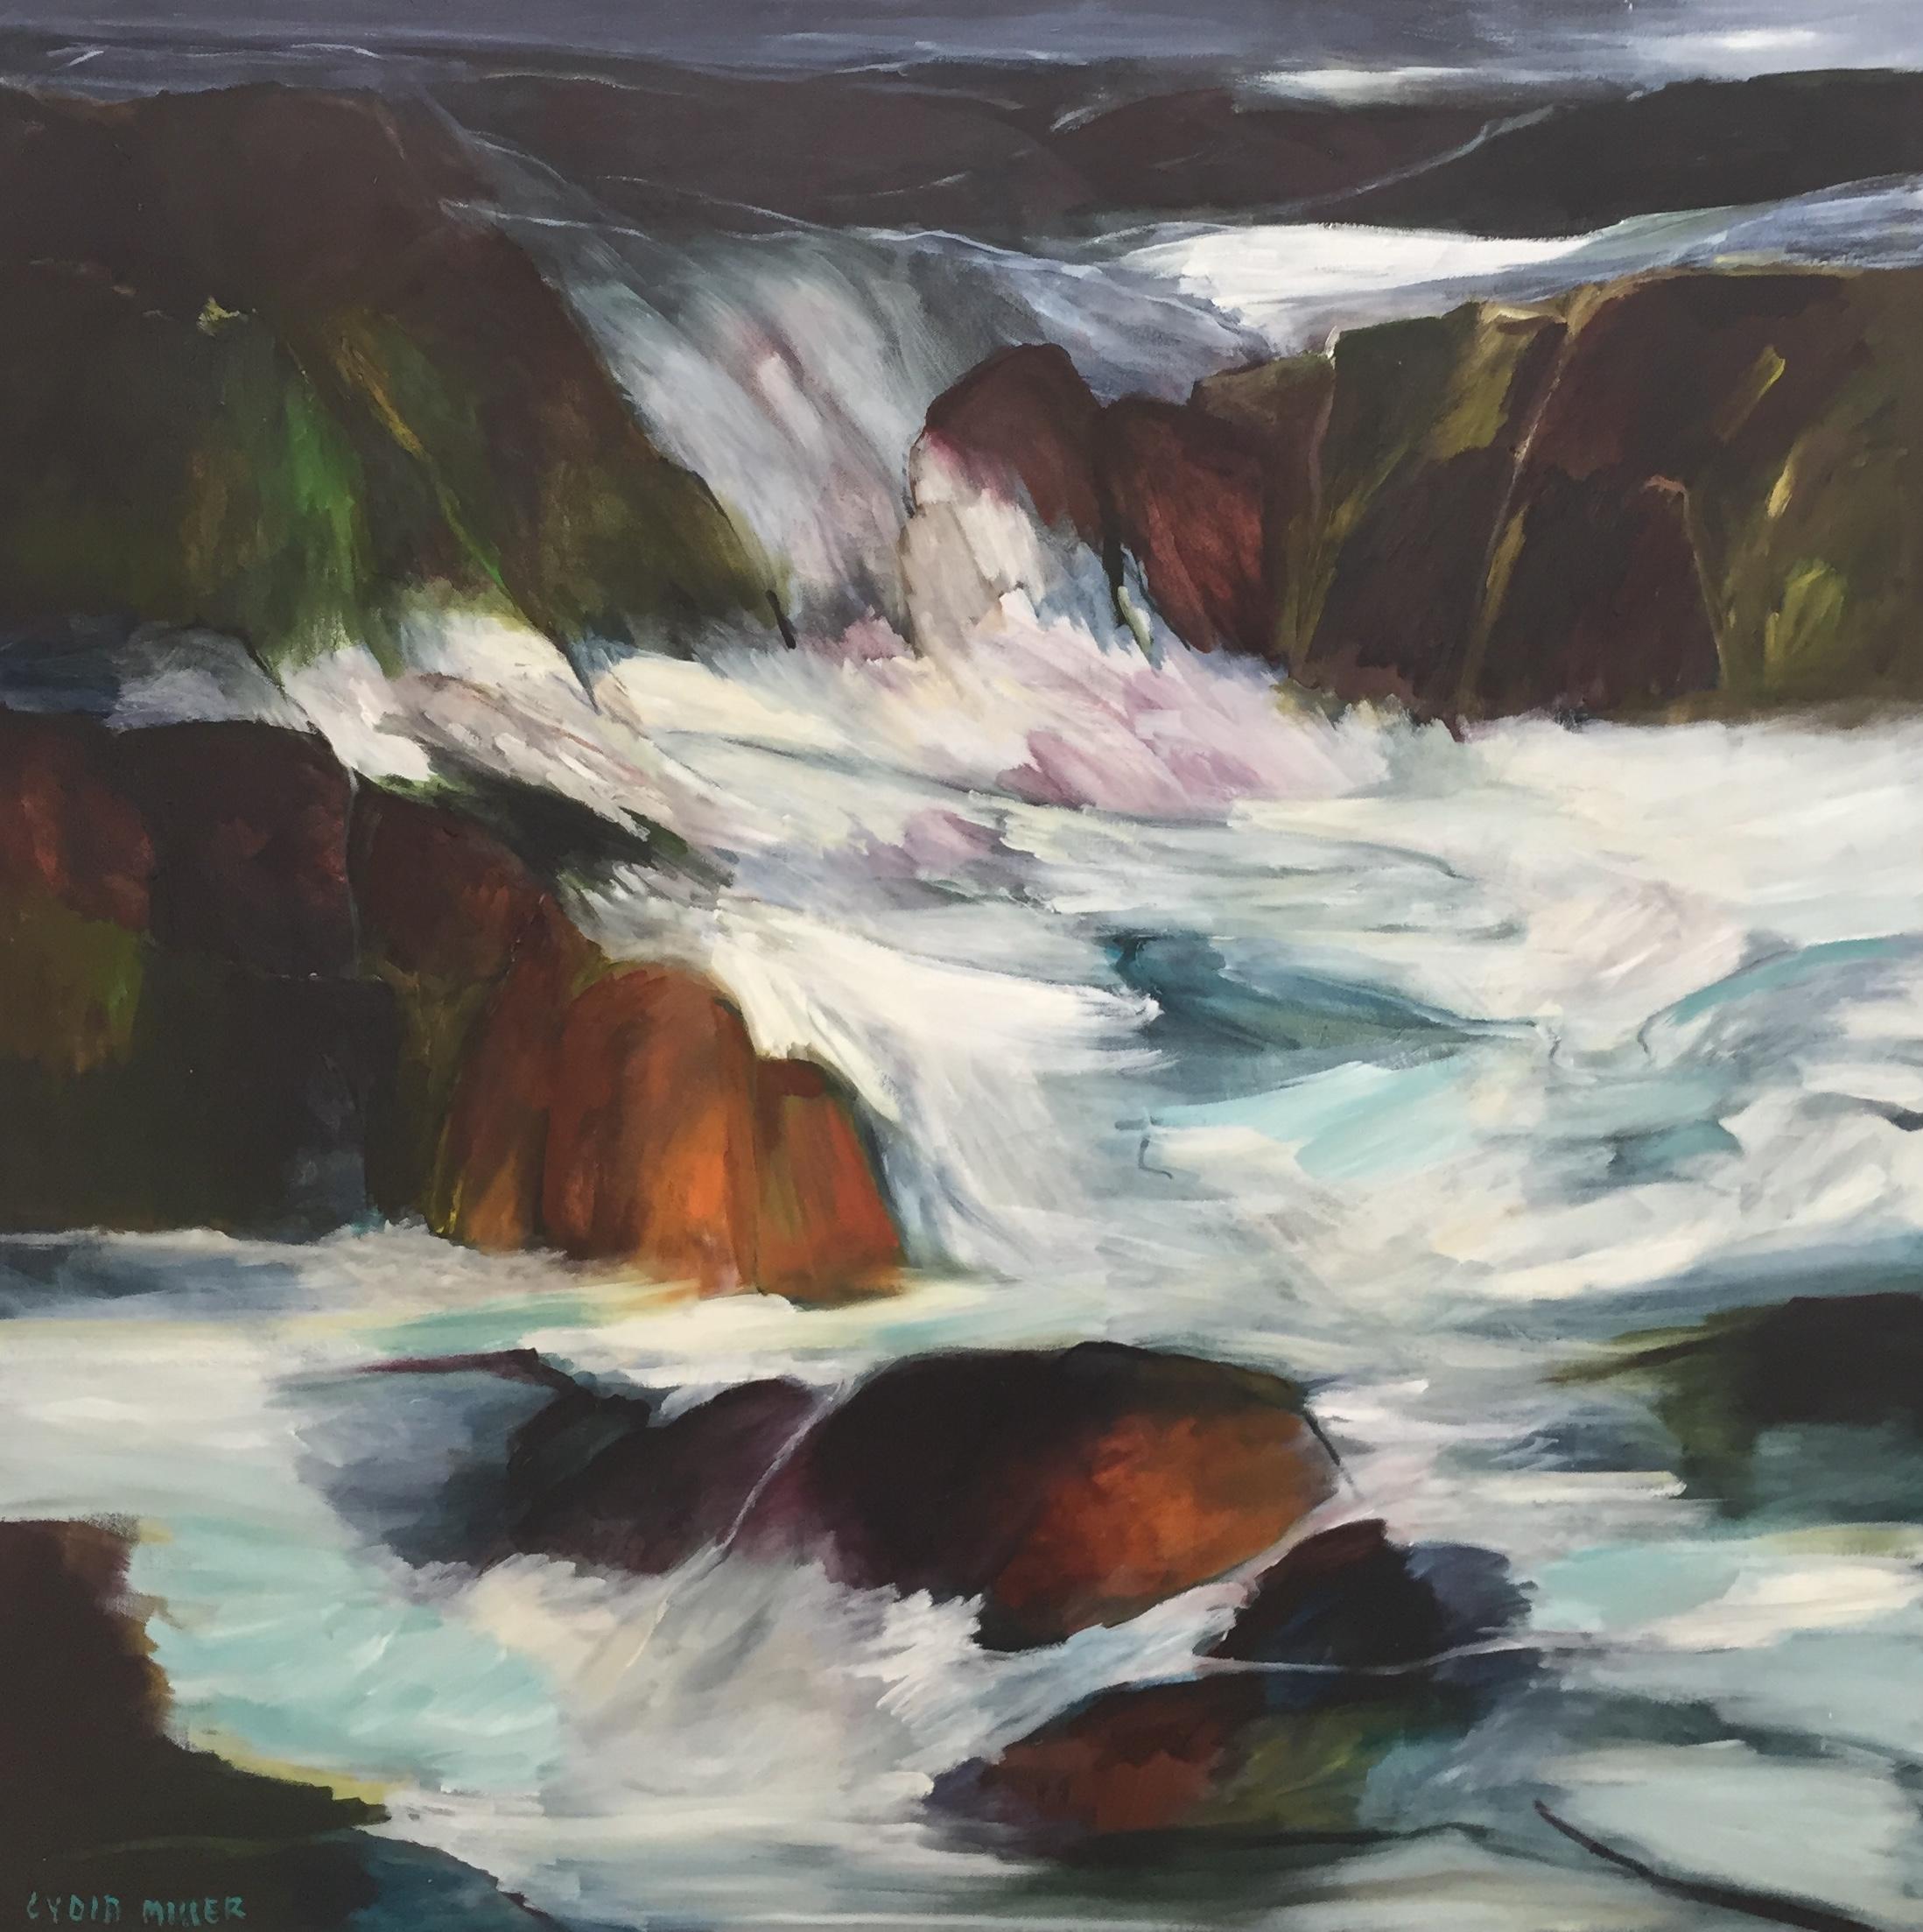 Lydia Miller_Cool Water II_2018_oil on canvas_90 x 90cm_$1500.00.jpg